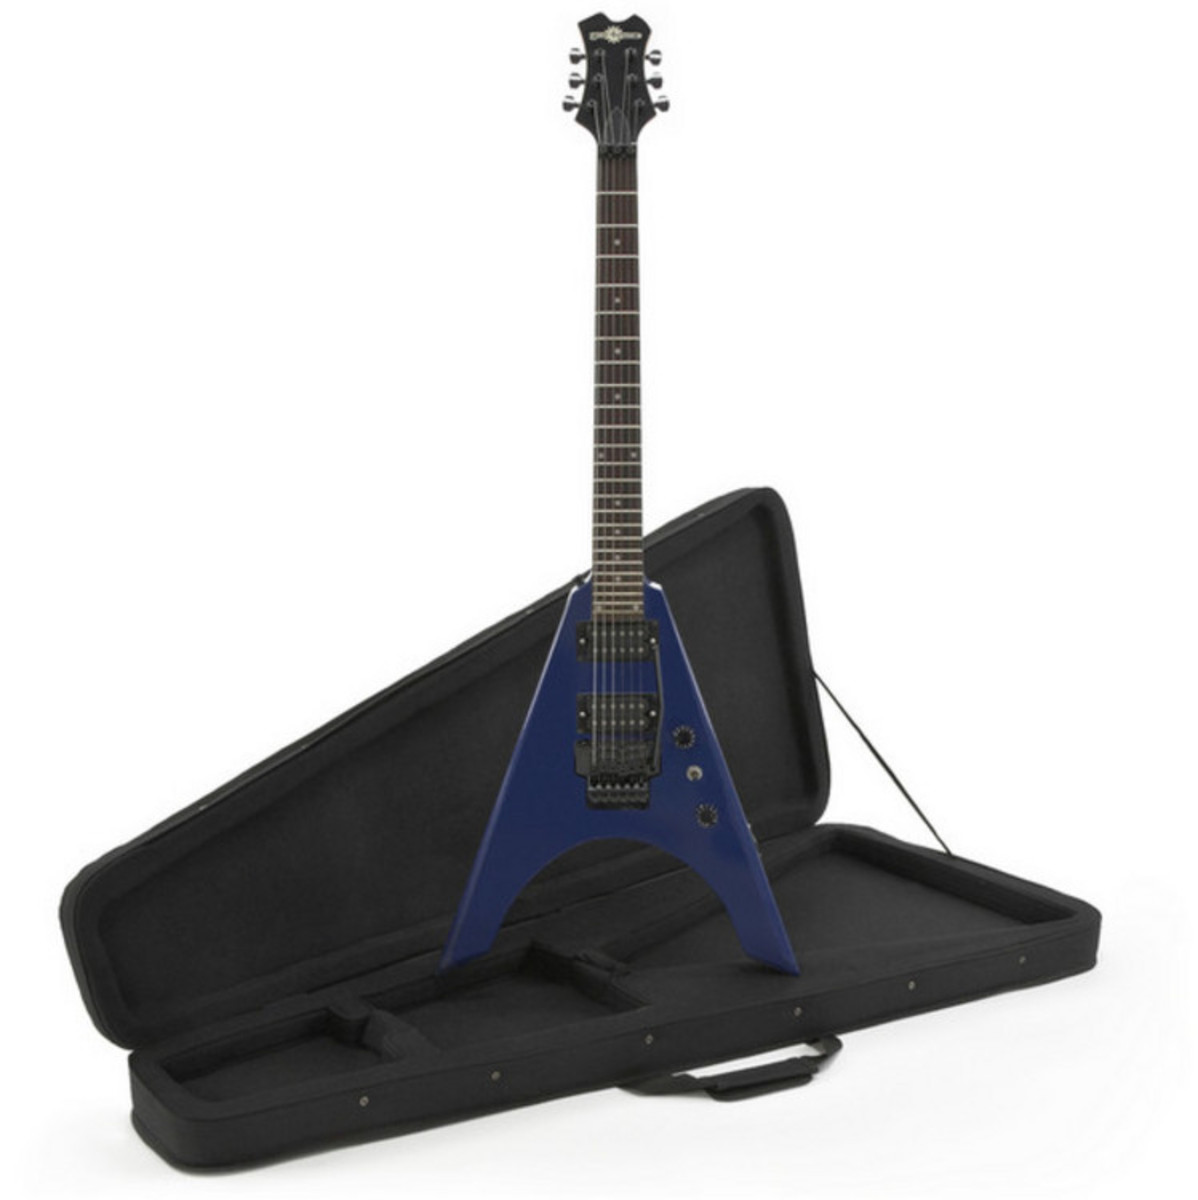 rocksmith xbox 360 houston electric guitar blue at. Black Bedroom Furniture Sets. Home Design Ideas